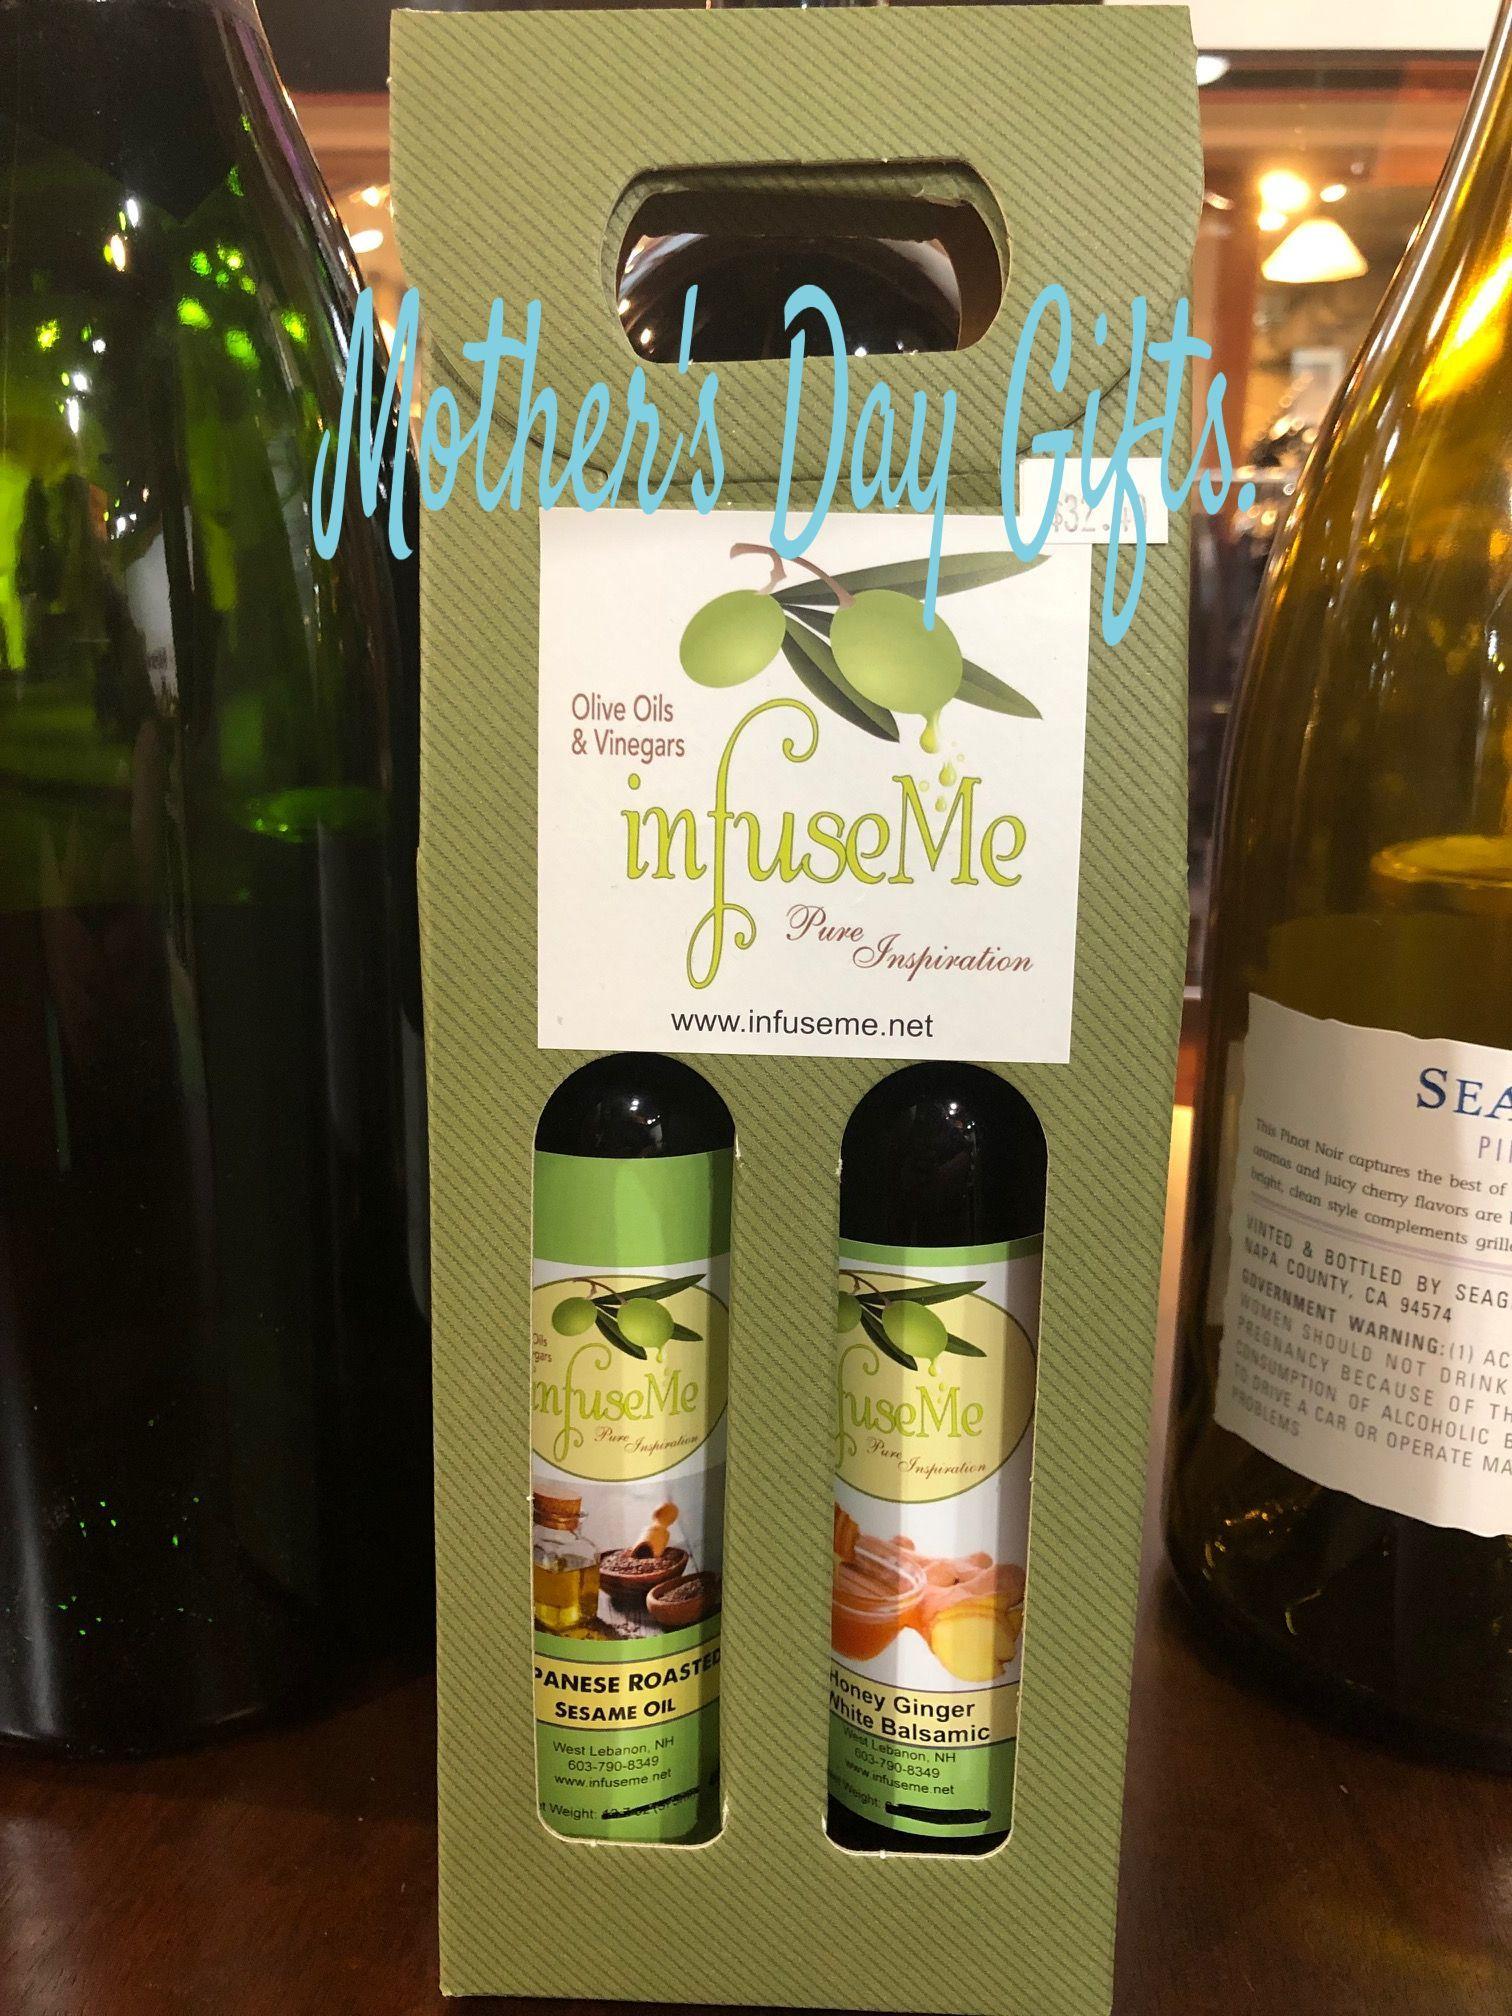 infusemeinc tastingcenter powerhousemallshopping mothersday smallbusiness shoplocal gifts uppervalley lebanon hanover